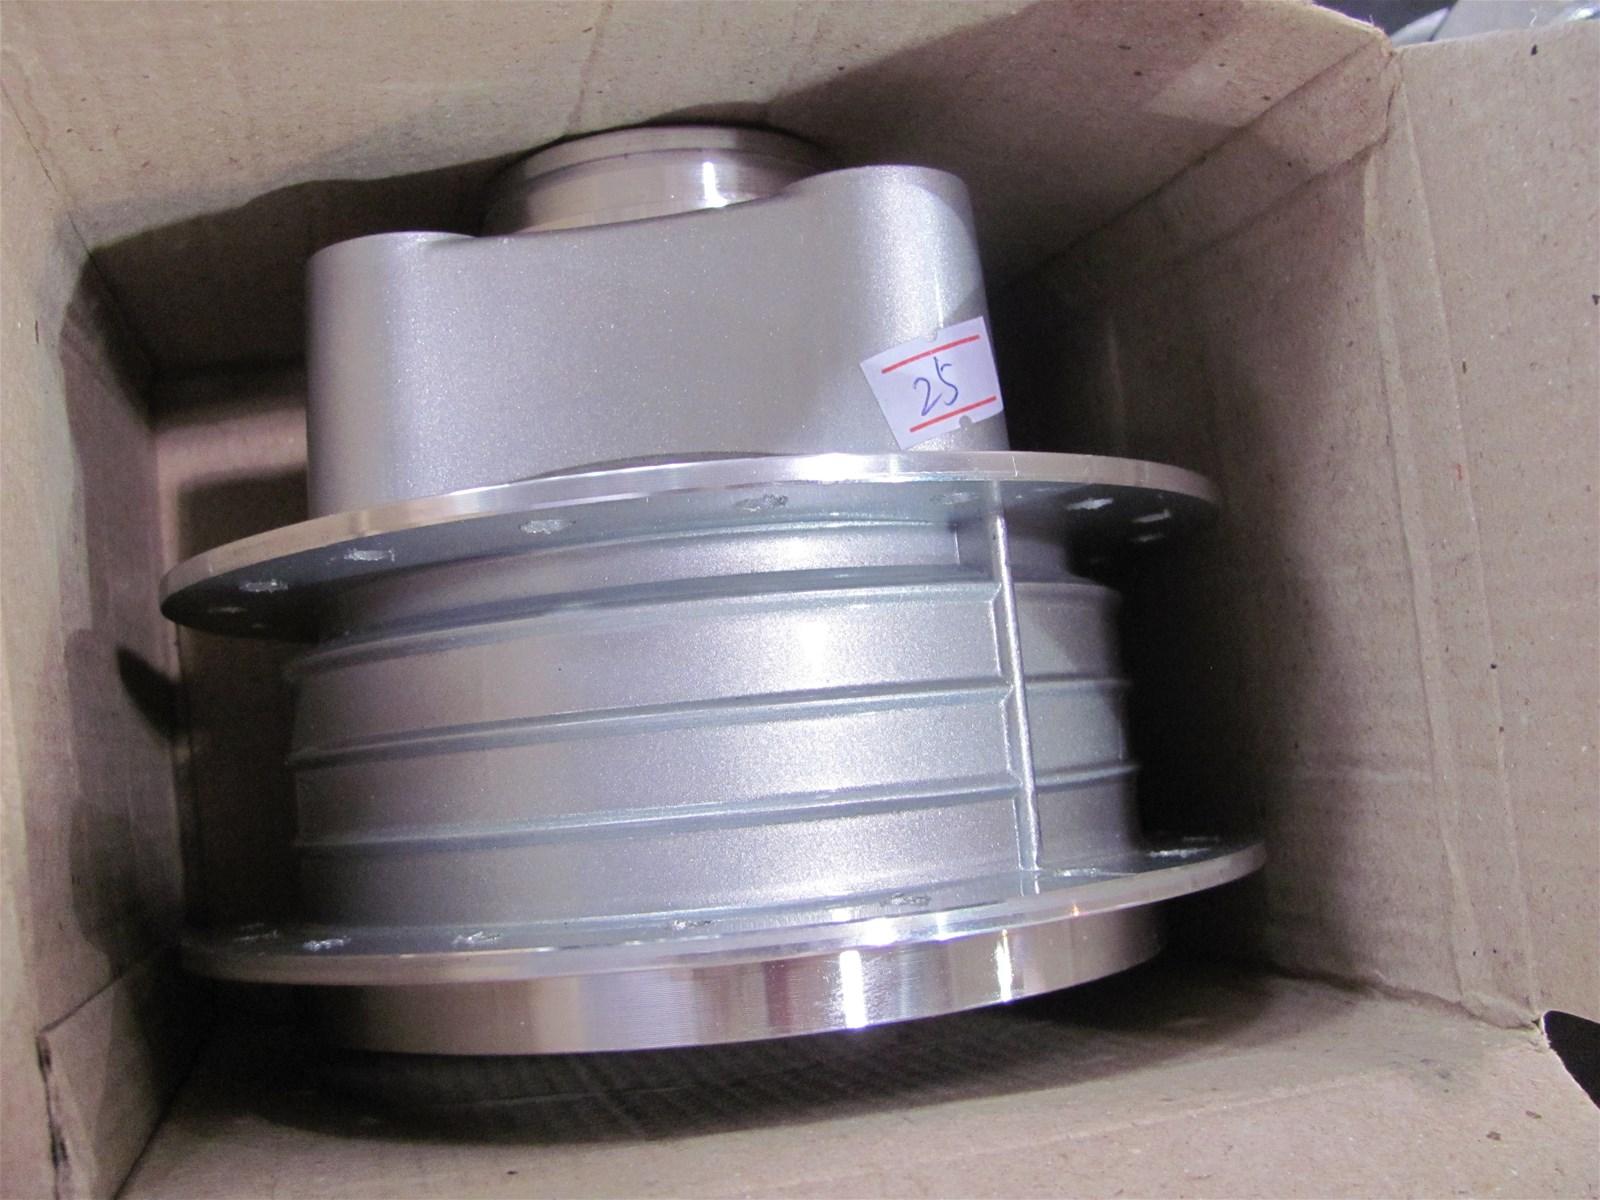 Ww6301 Cg125 Motorcycle Brake Wheel Hub Motorcycle Part